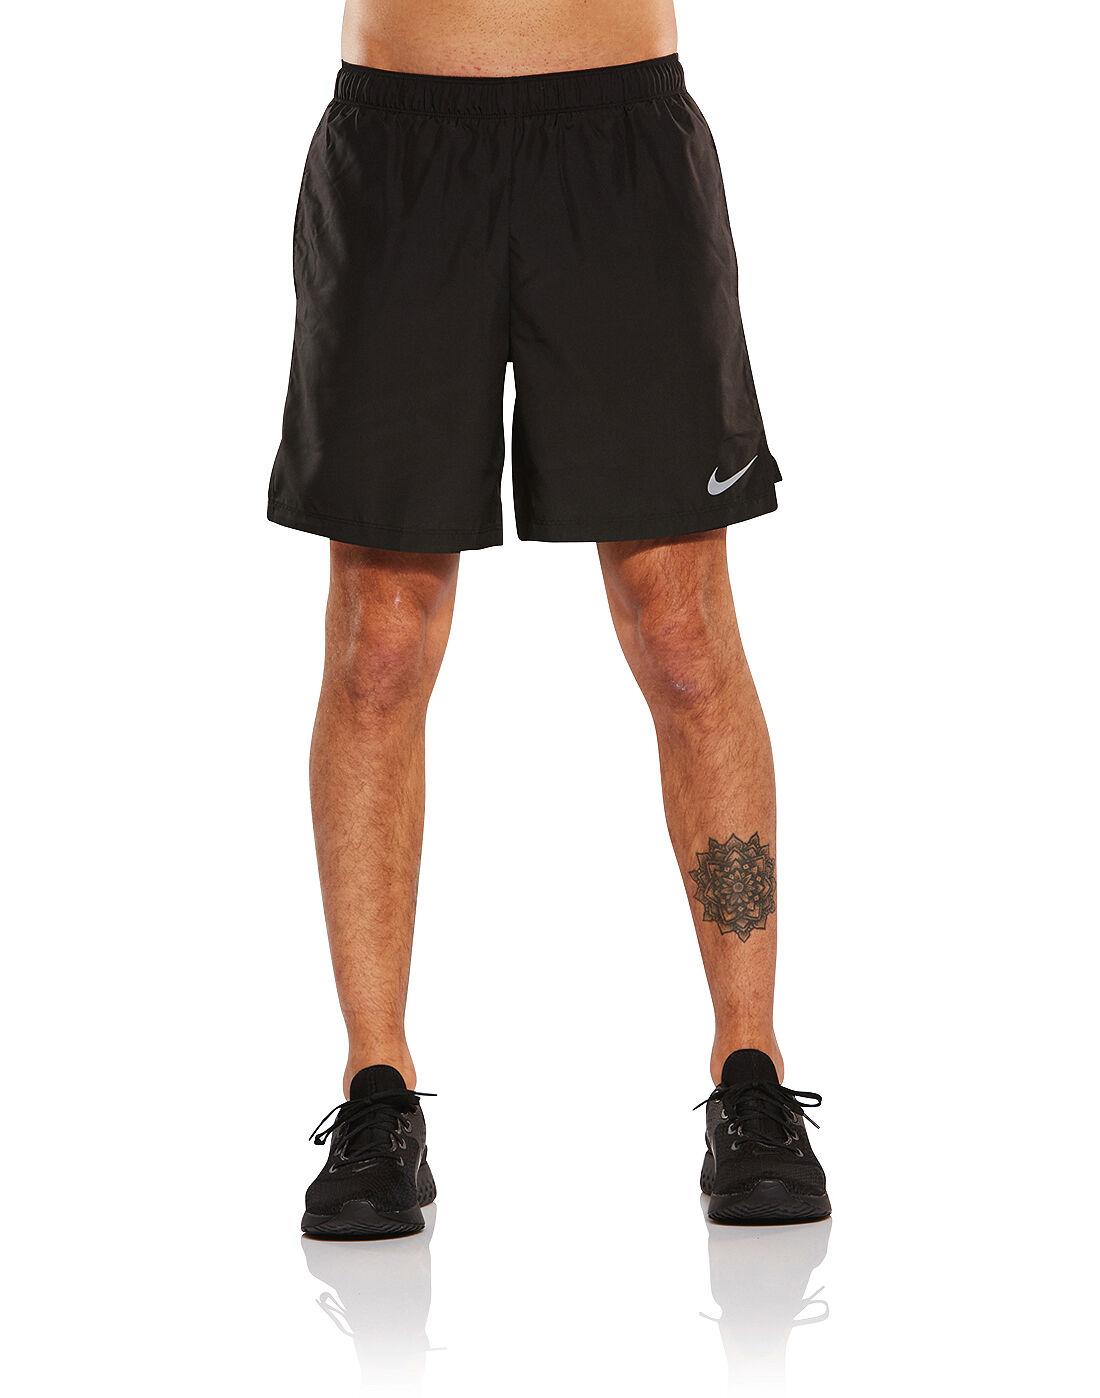 nike 7 inch shorts grey